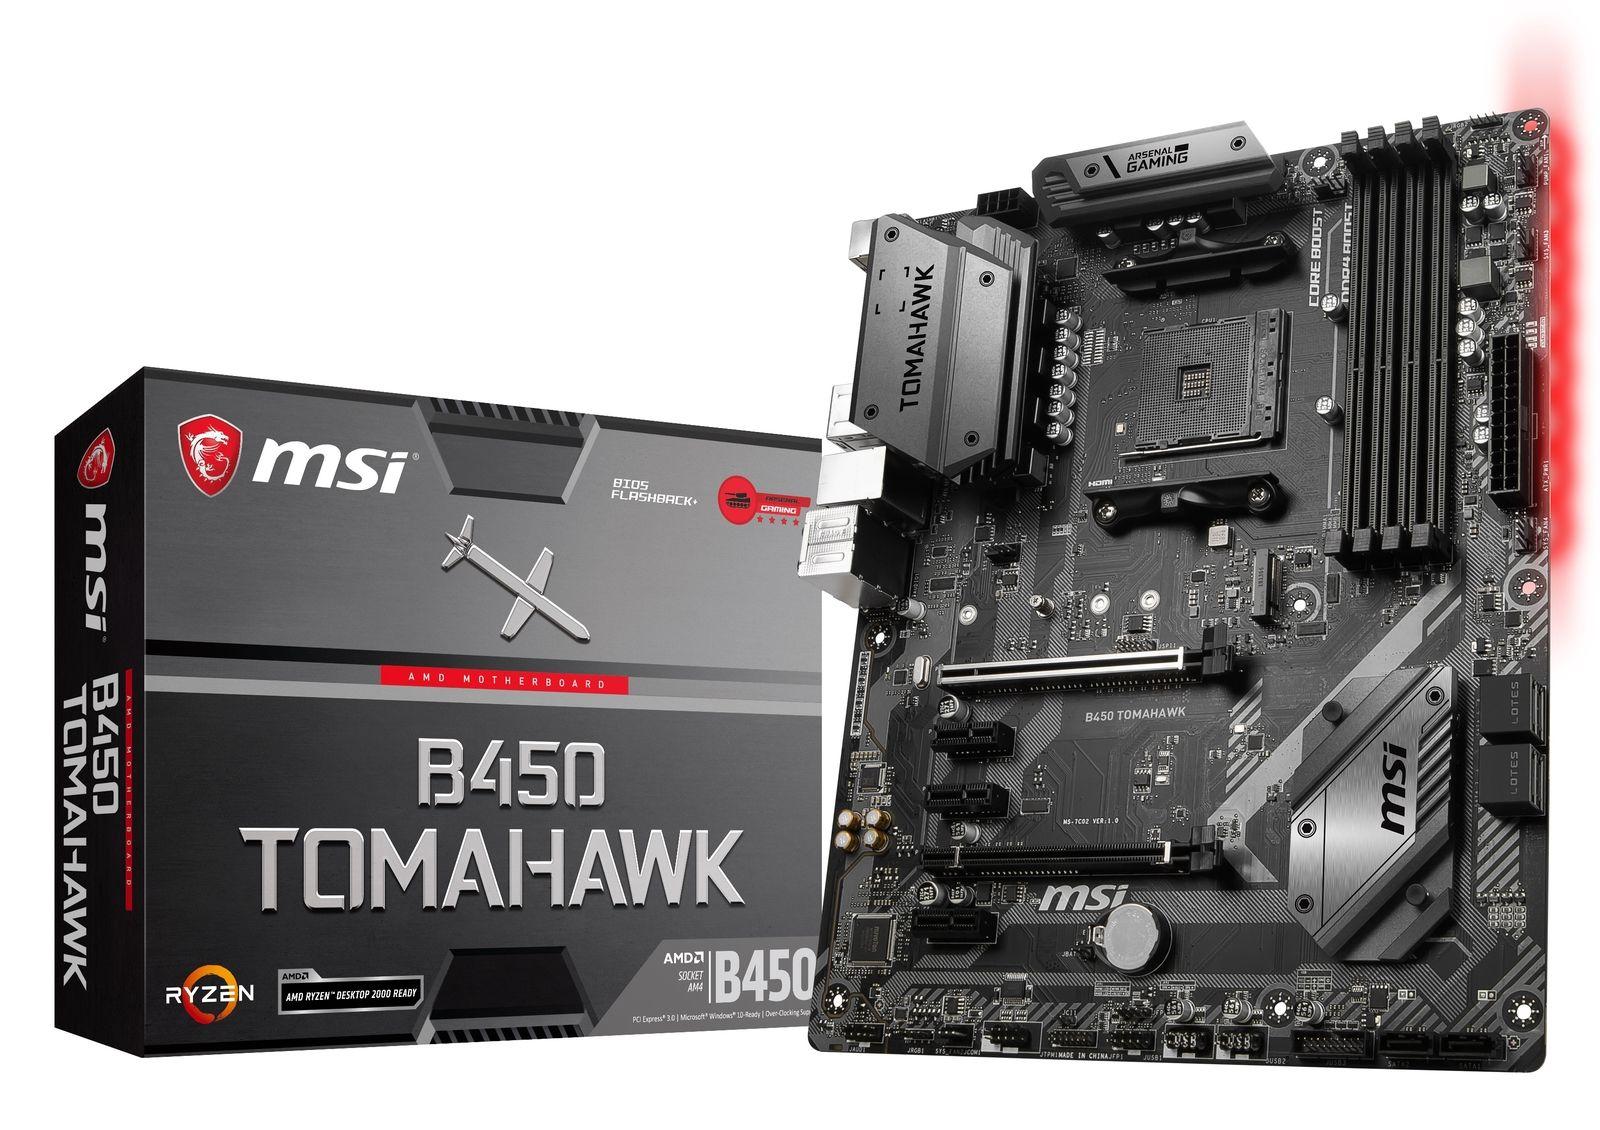 MSI B450 Tomahawk $109.99 YMMV